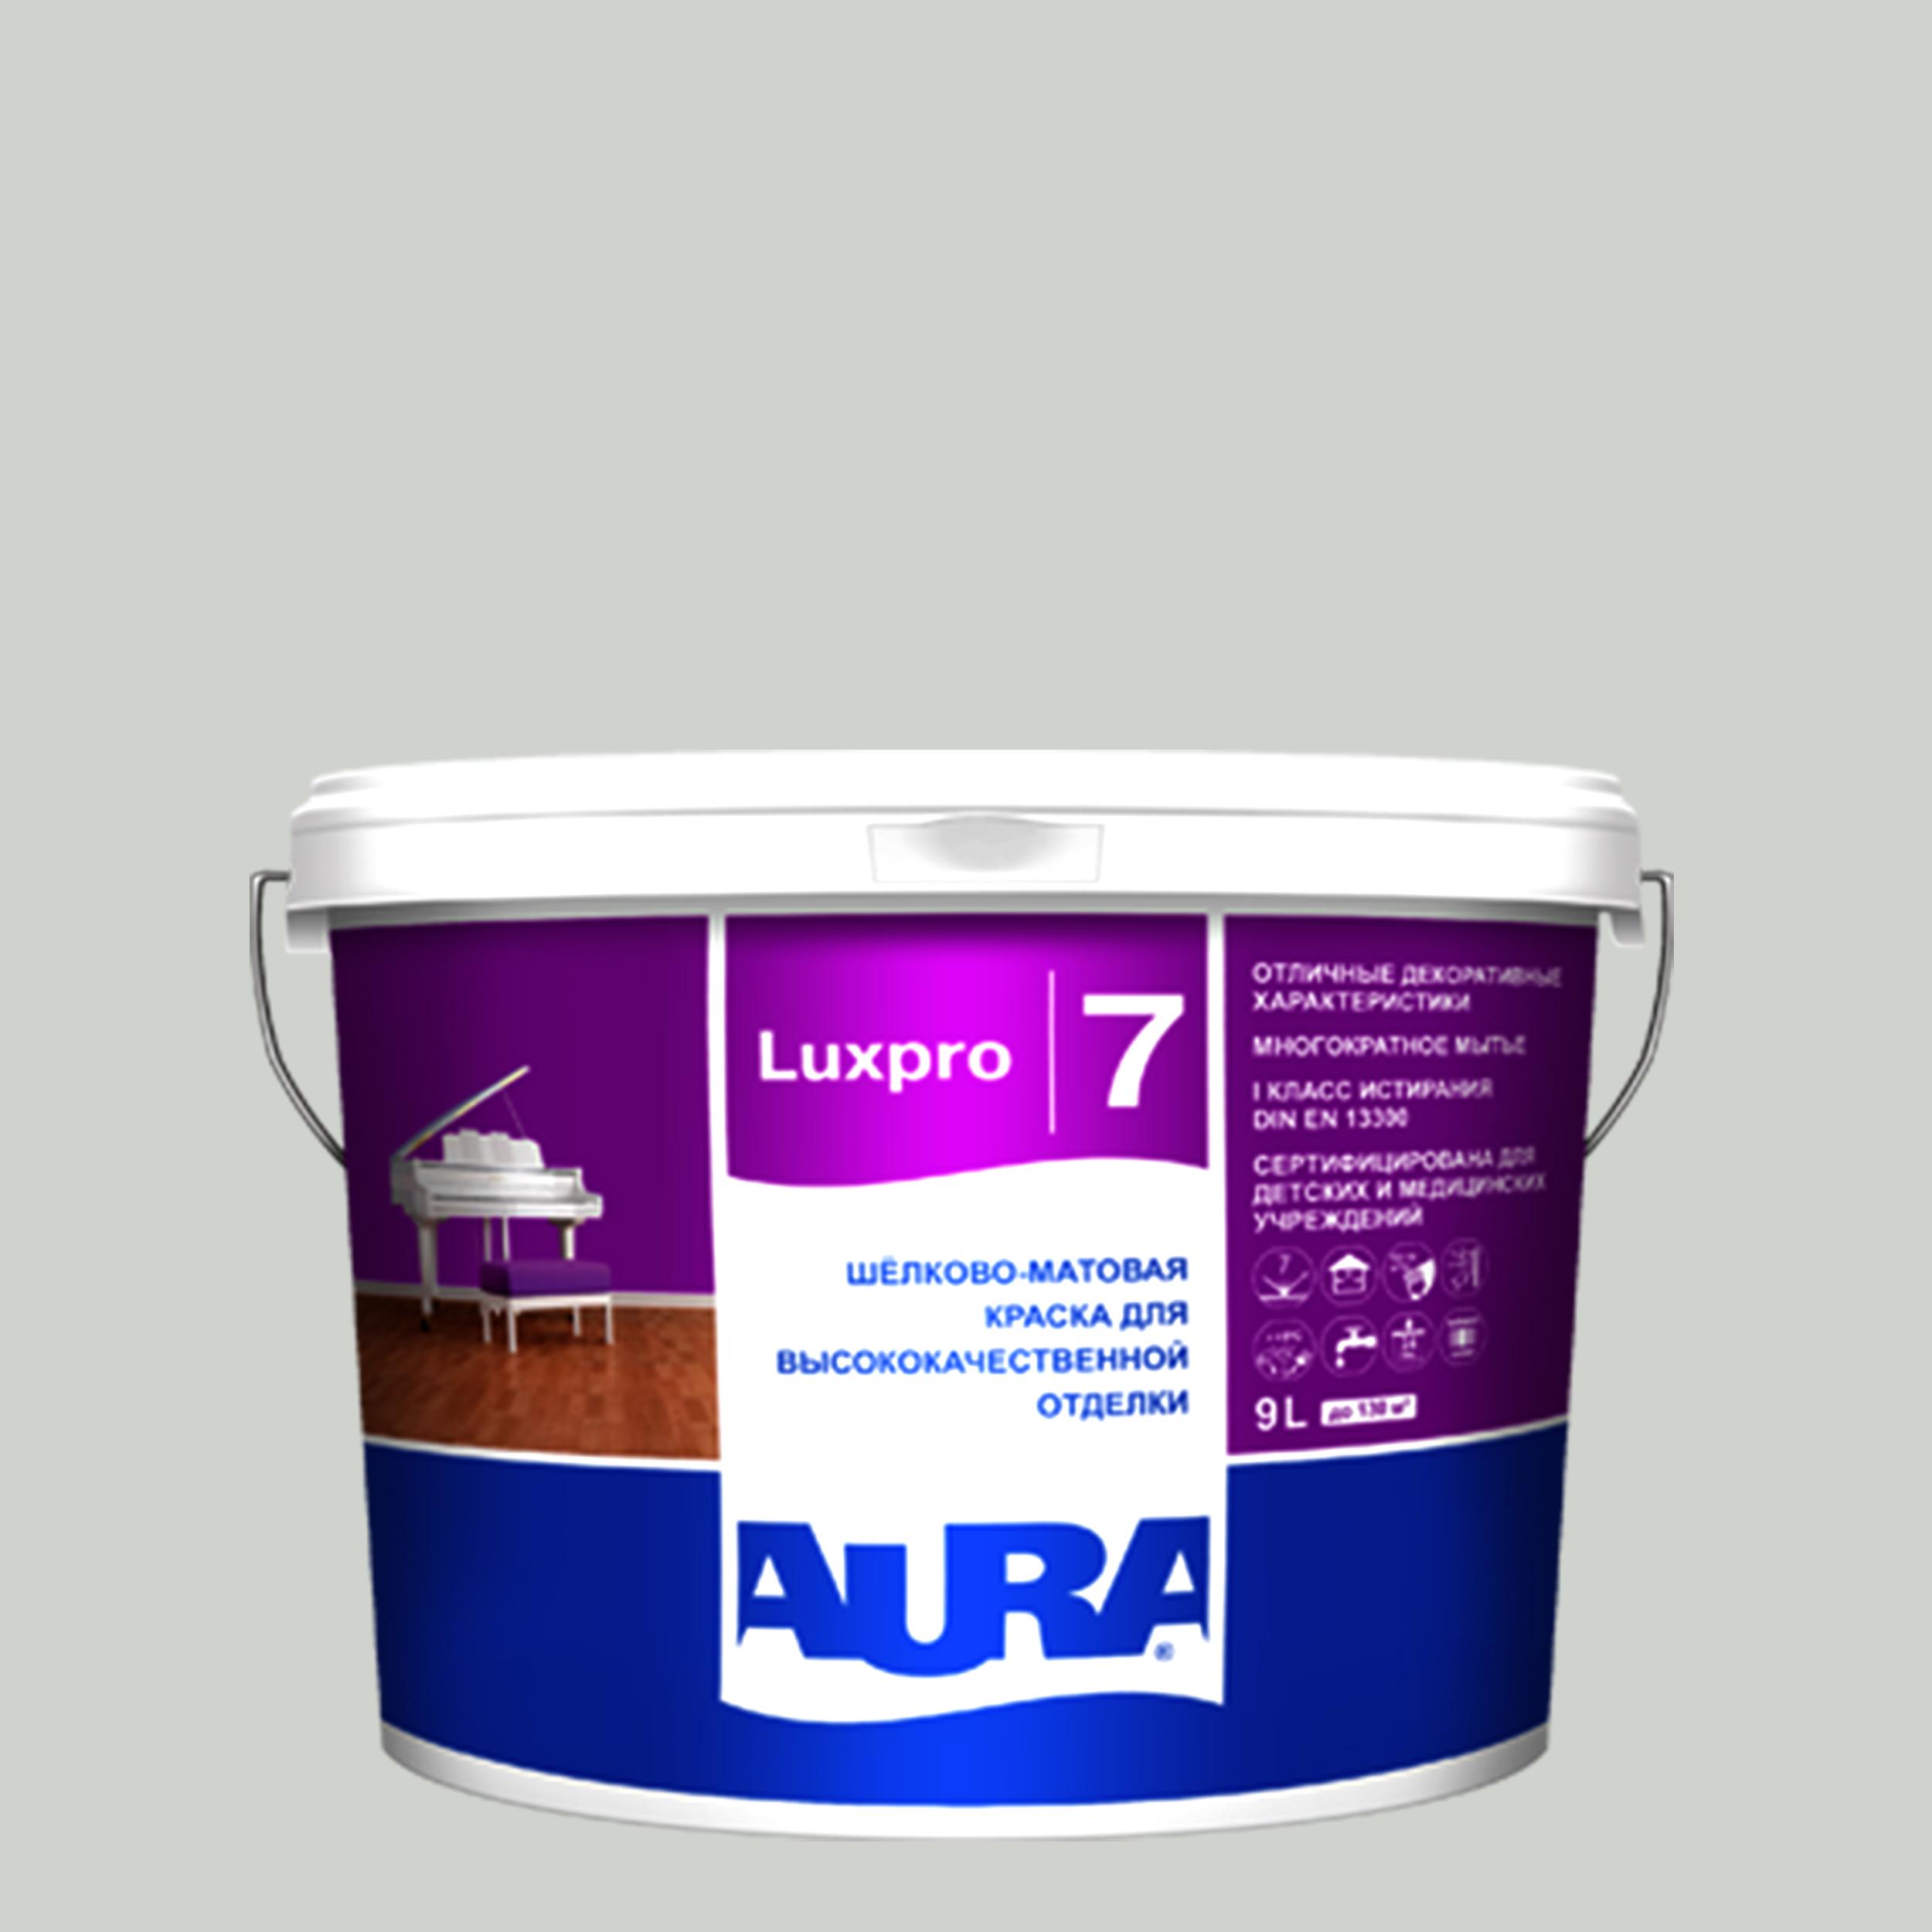 Фото 4 - Краска интерьерная, Aura LuxPRO 7, RAL 6002, 11 кг.